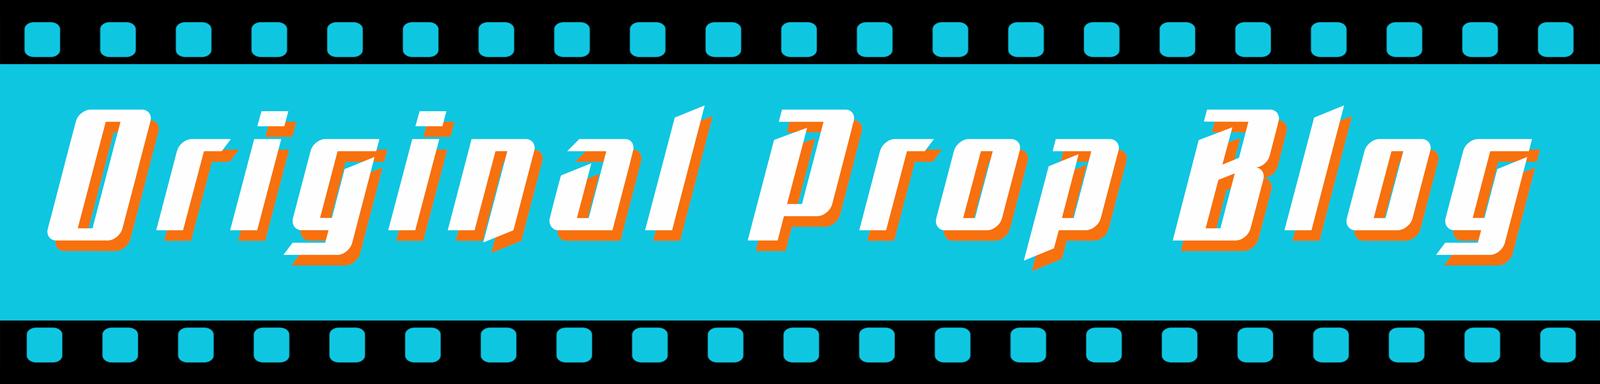 Movie Prop Collecting with Jason DeBord's Original Prop Blog Film & TV Prop, Costume, Hollywood Memorablia Pop Culture Resource